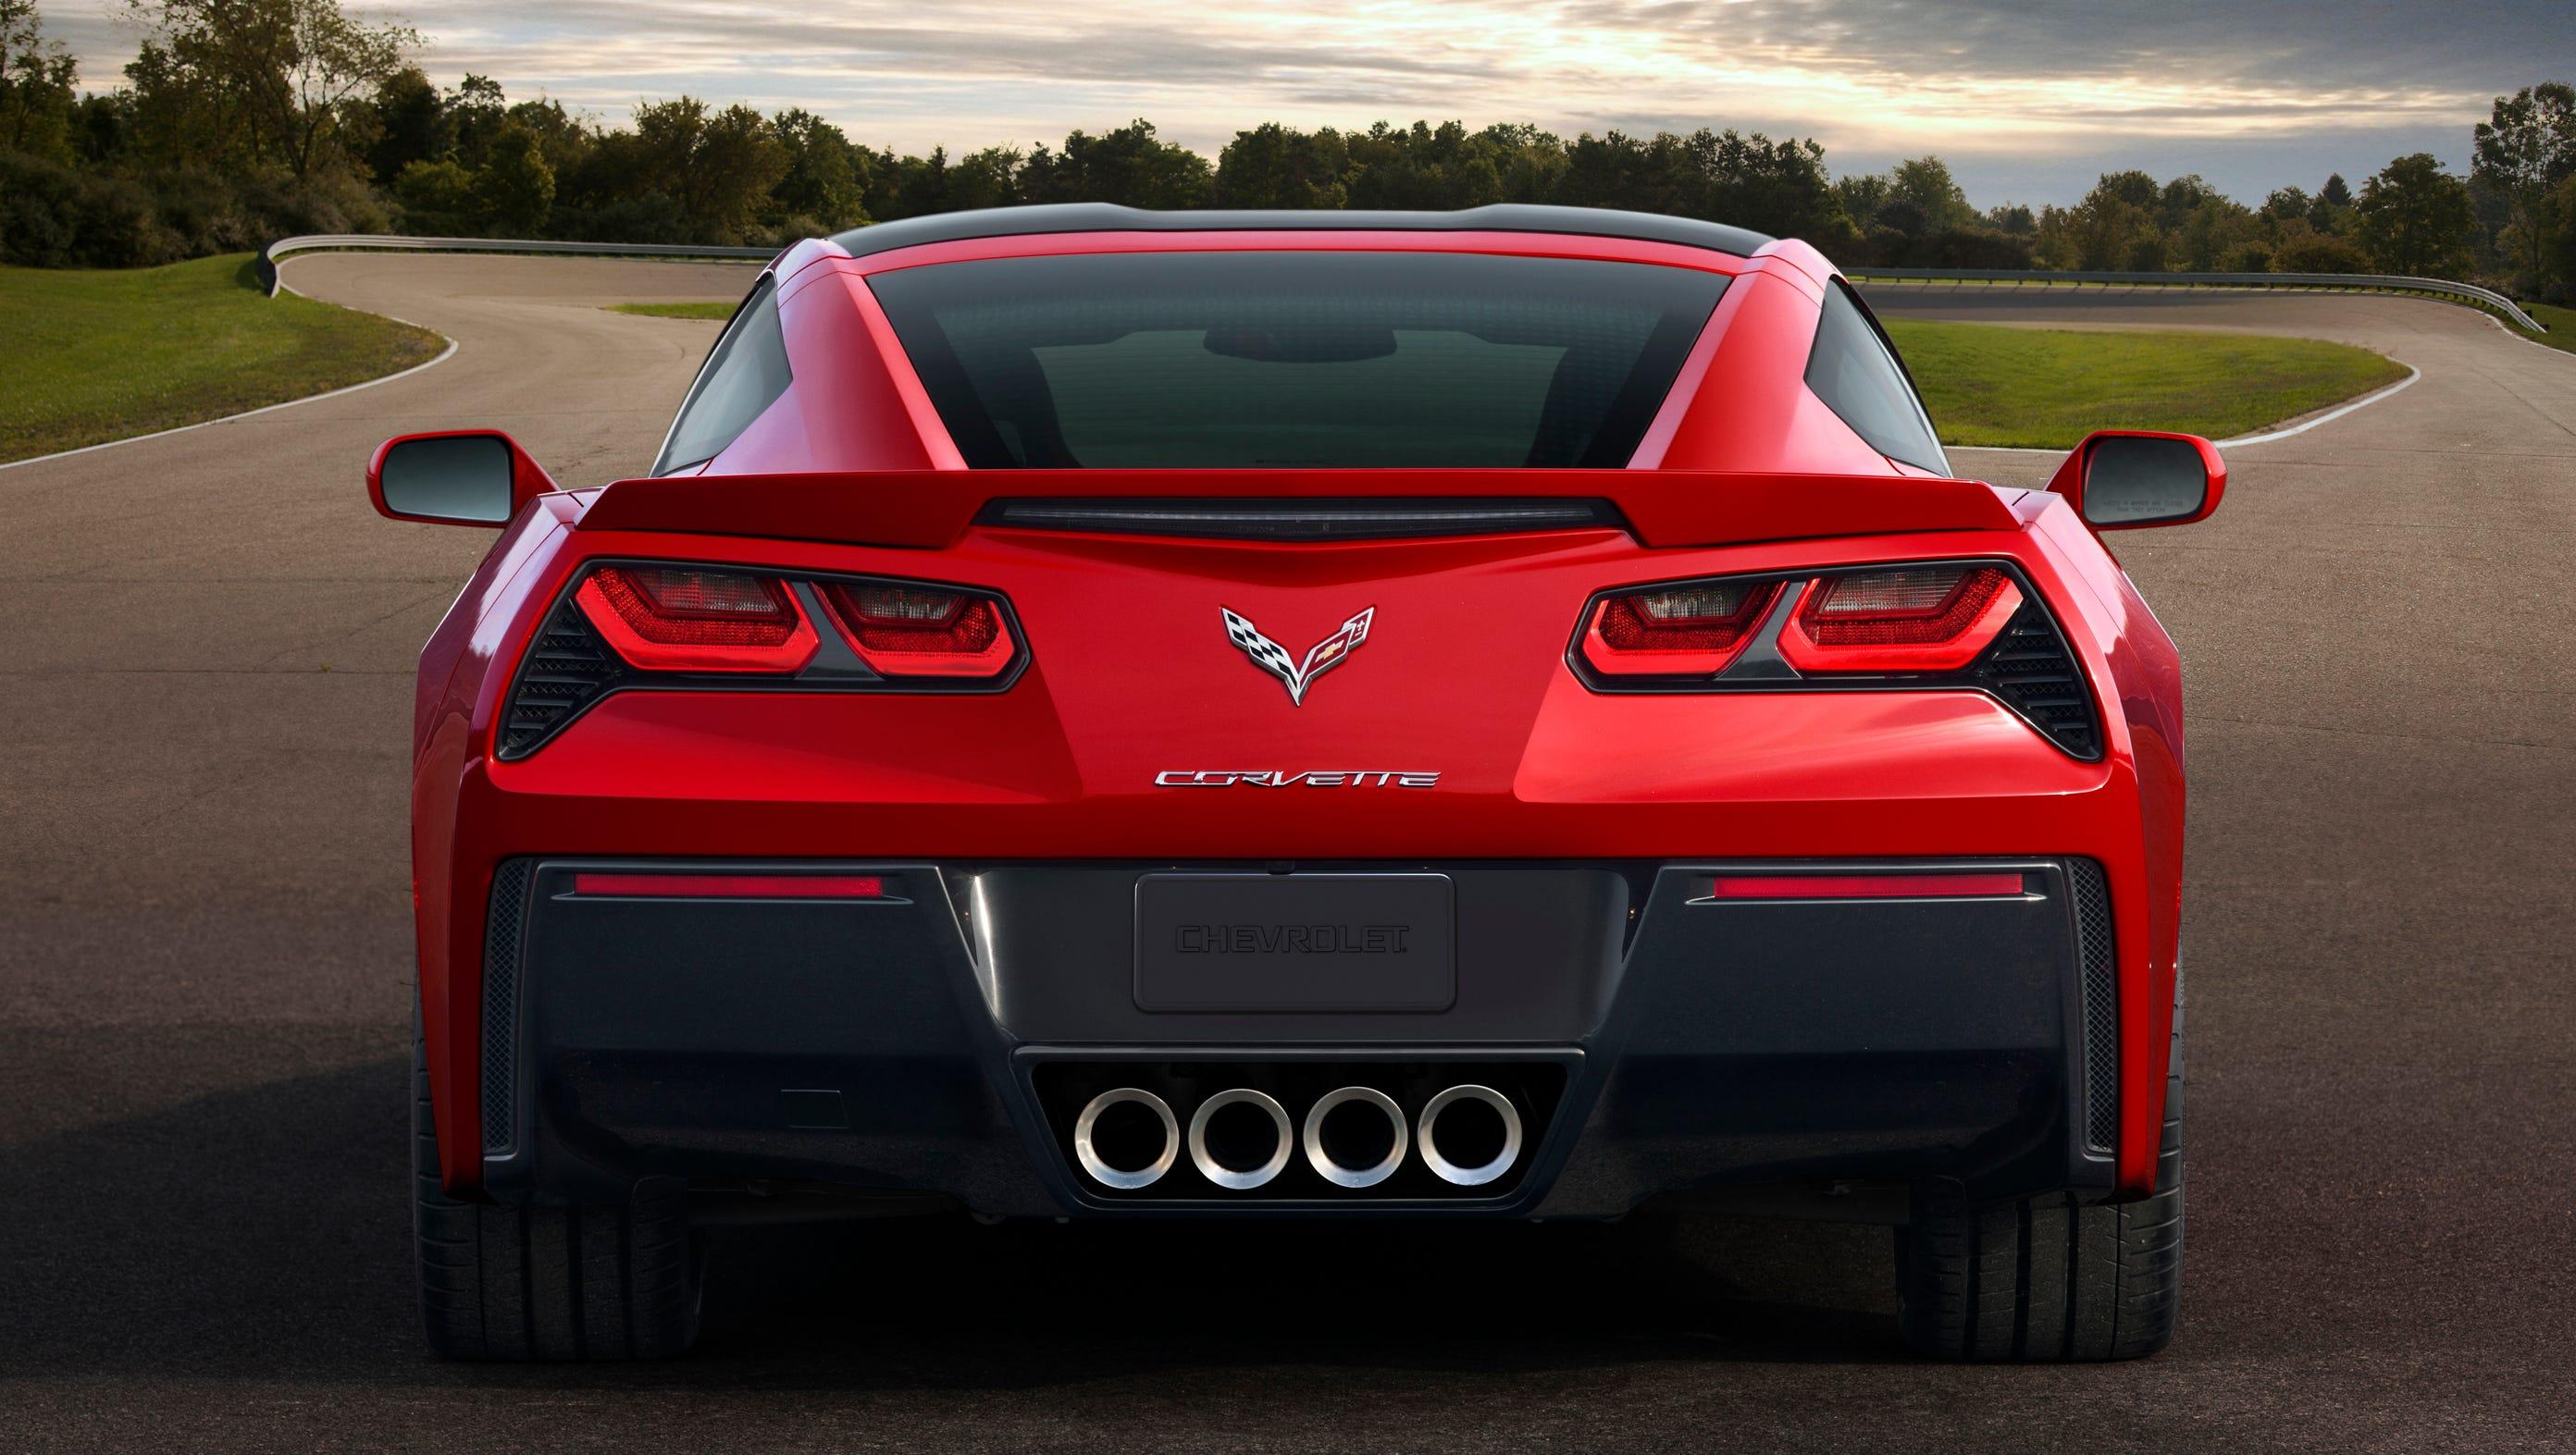 The rear stance of the redone 2014 Chevrolet Corvette Stingray.